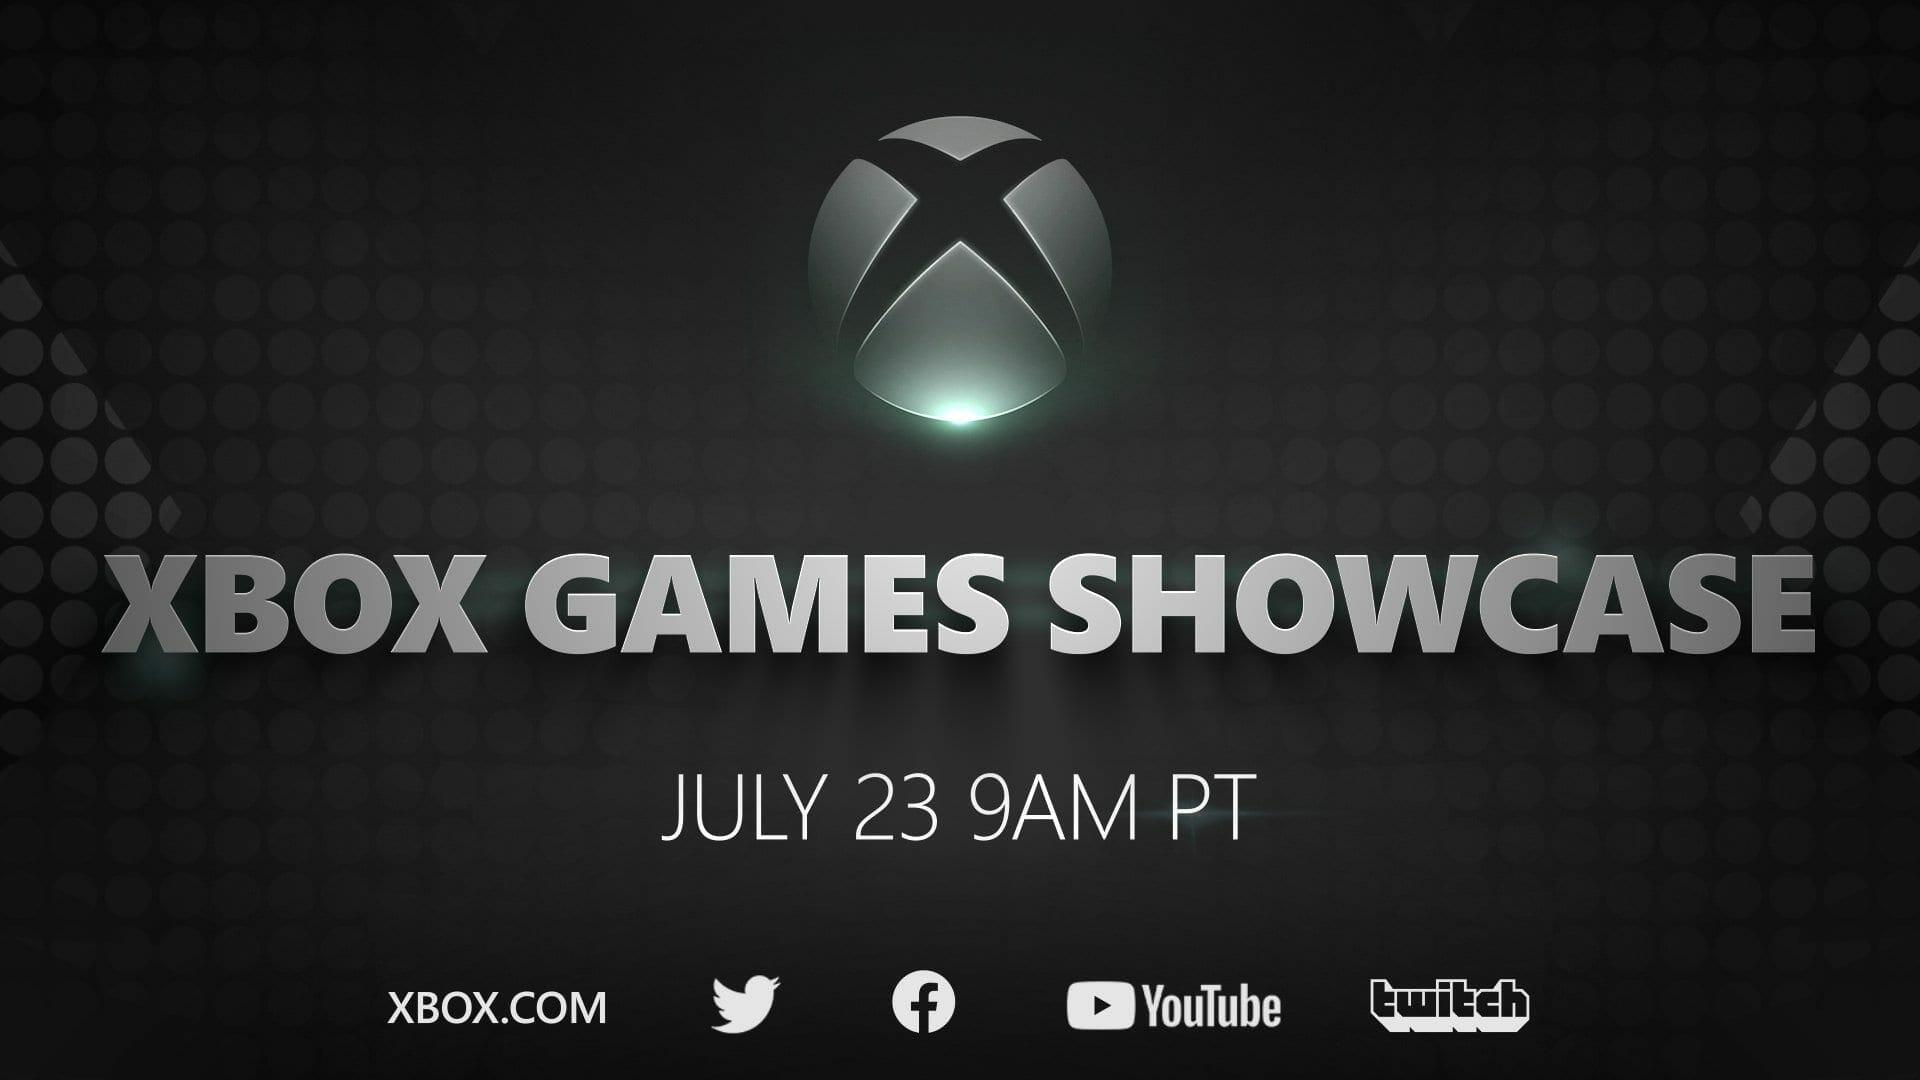 Xbox Showcase Event